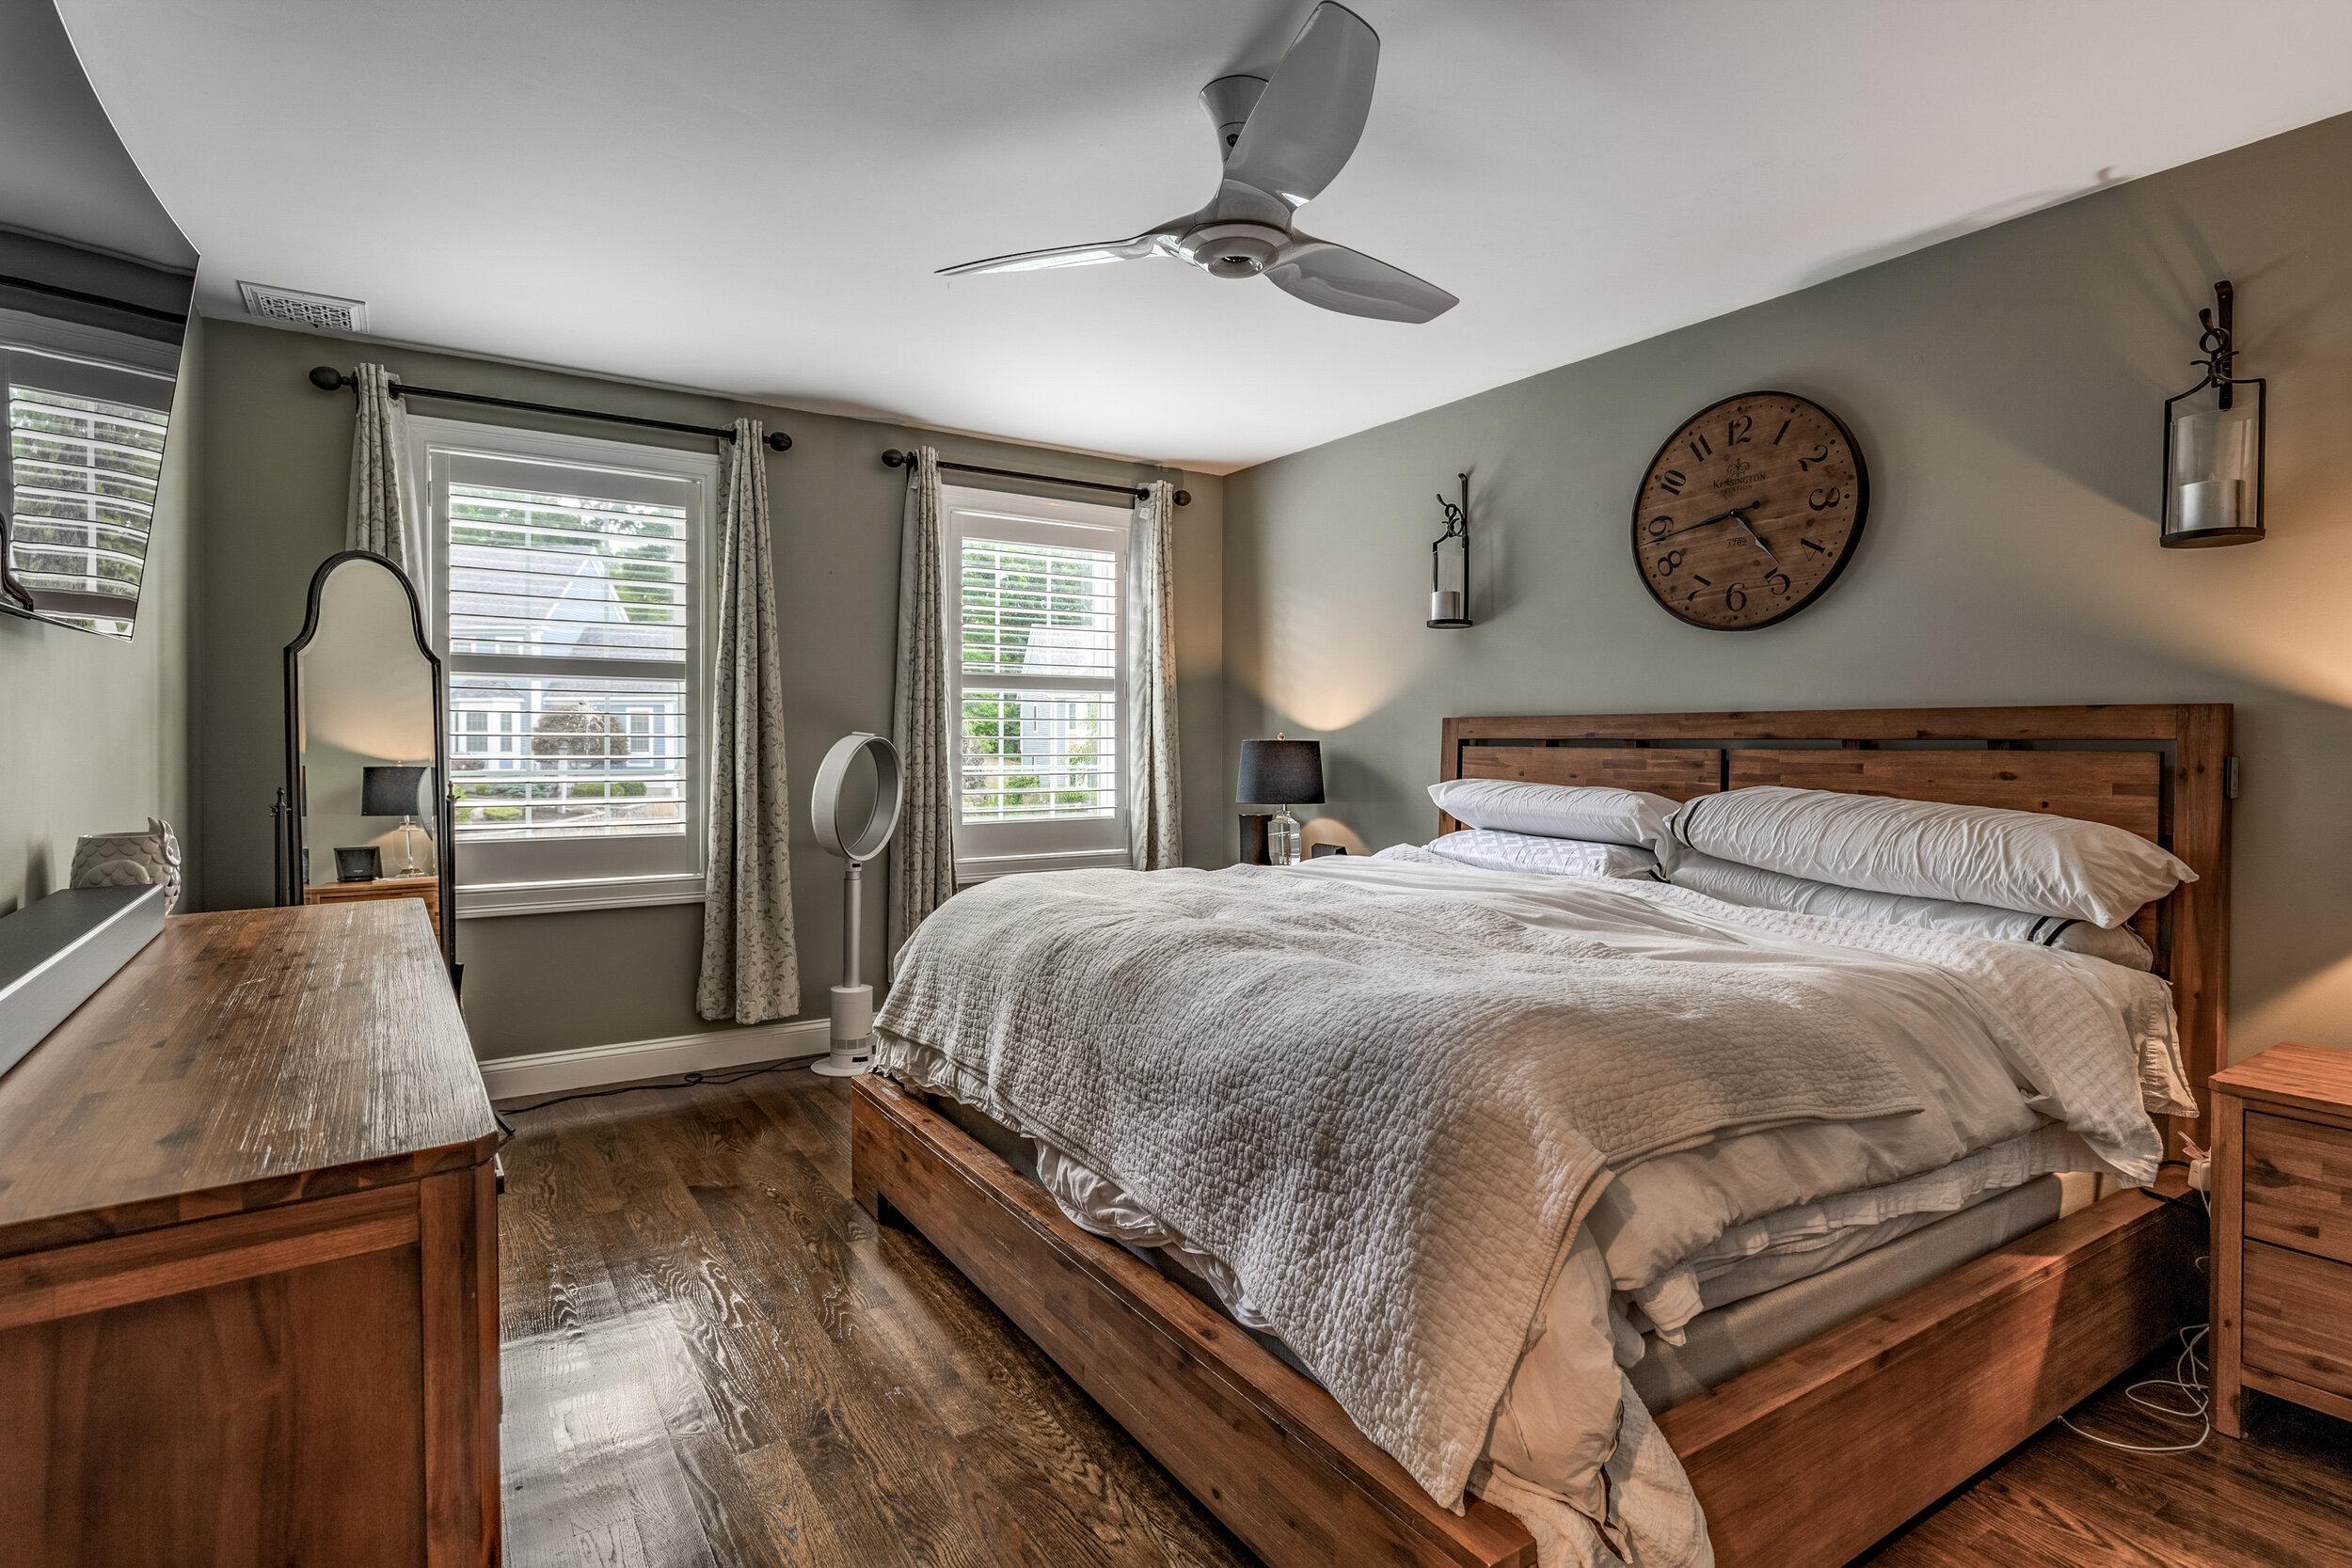 21_Bedroom-7.jpg